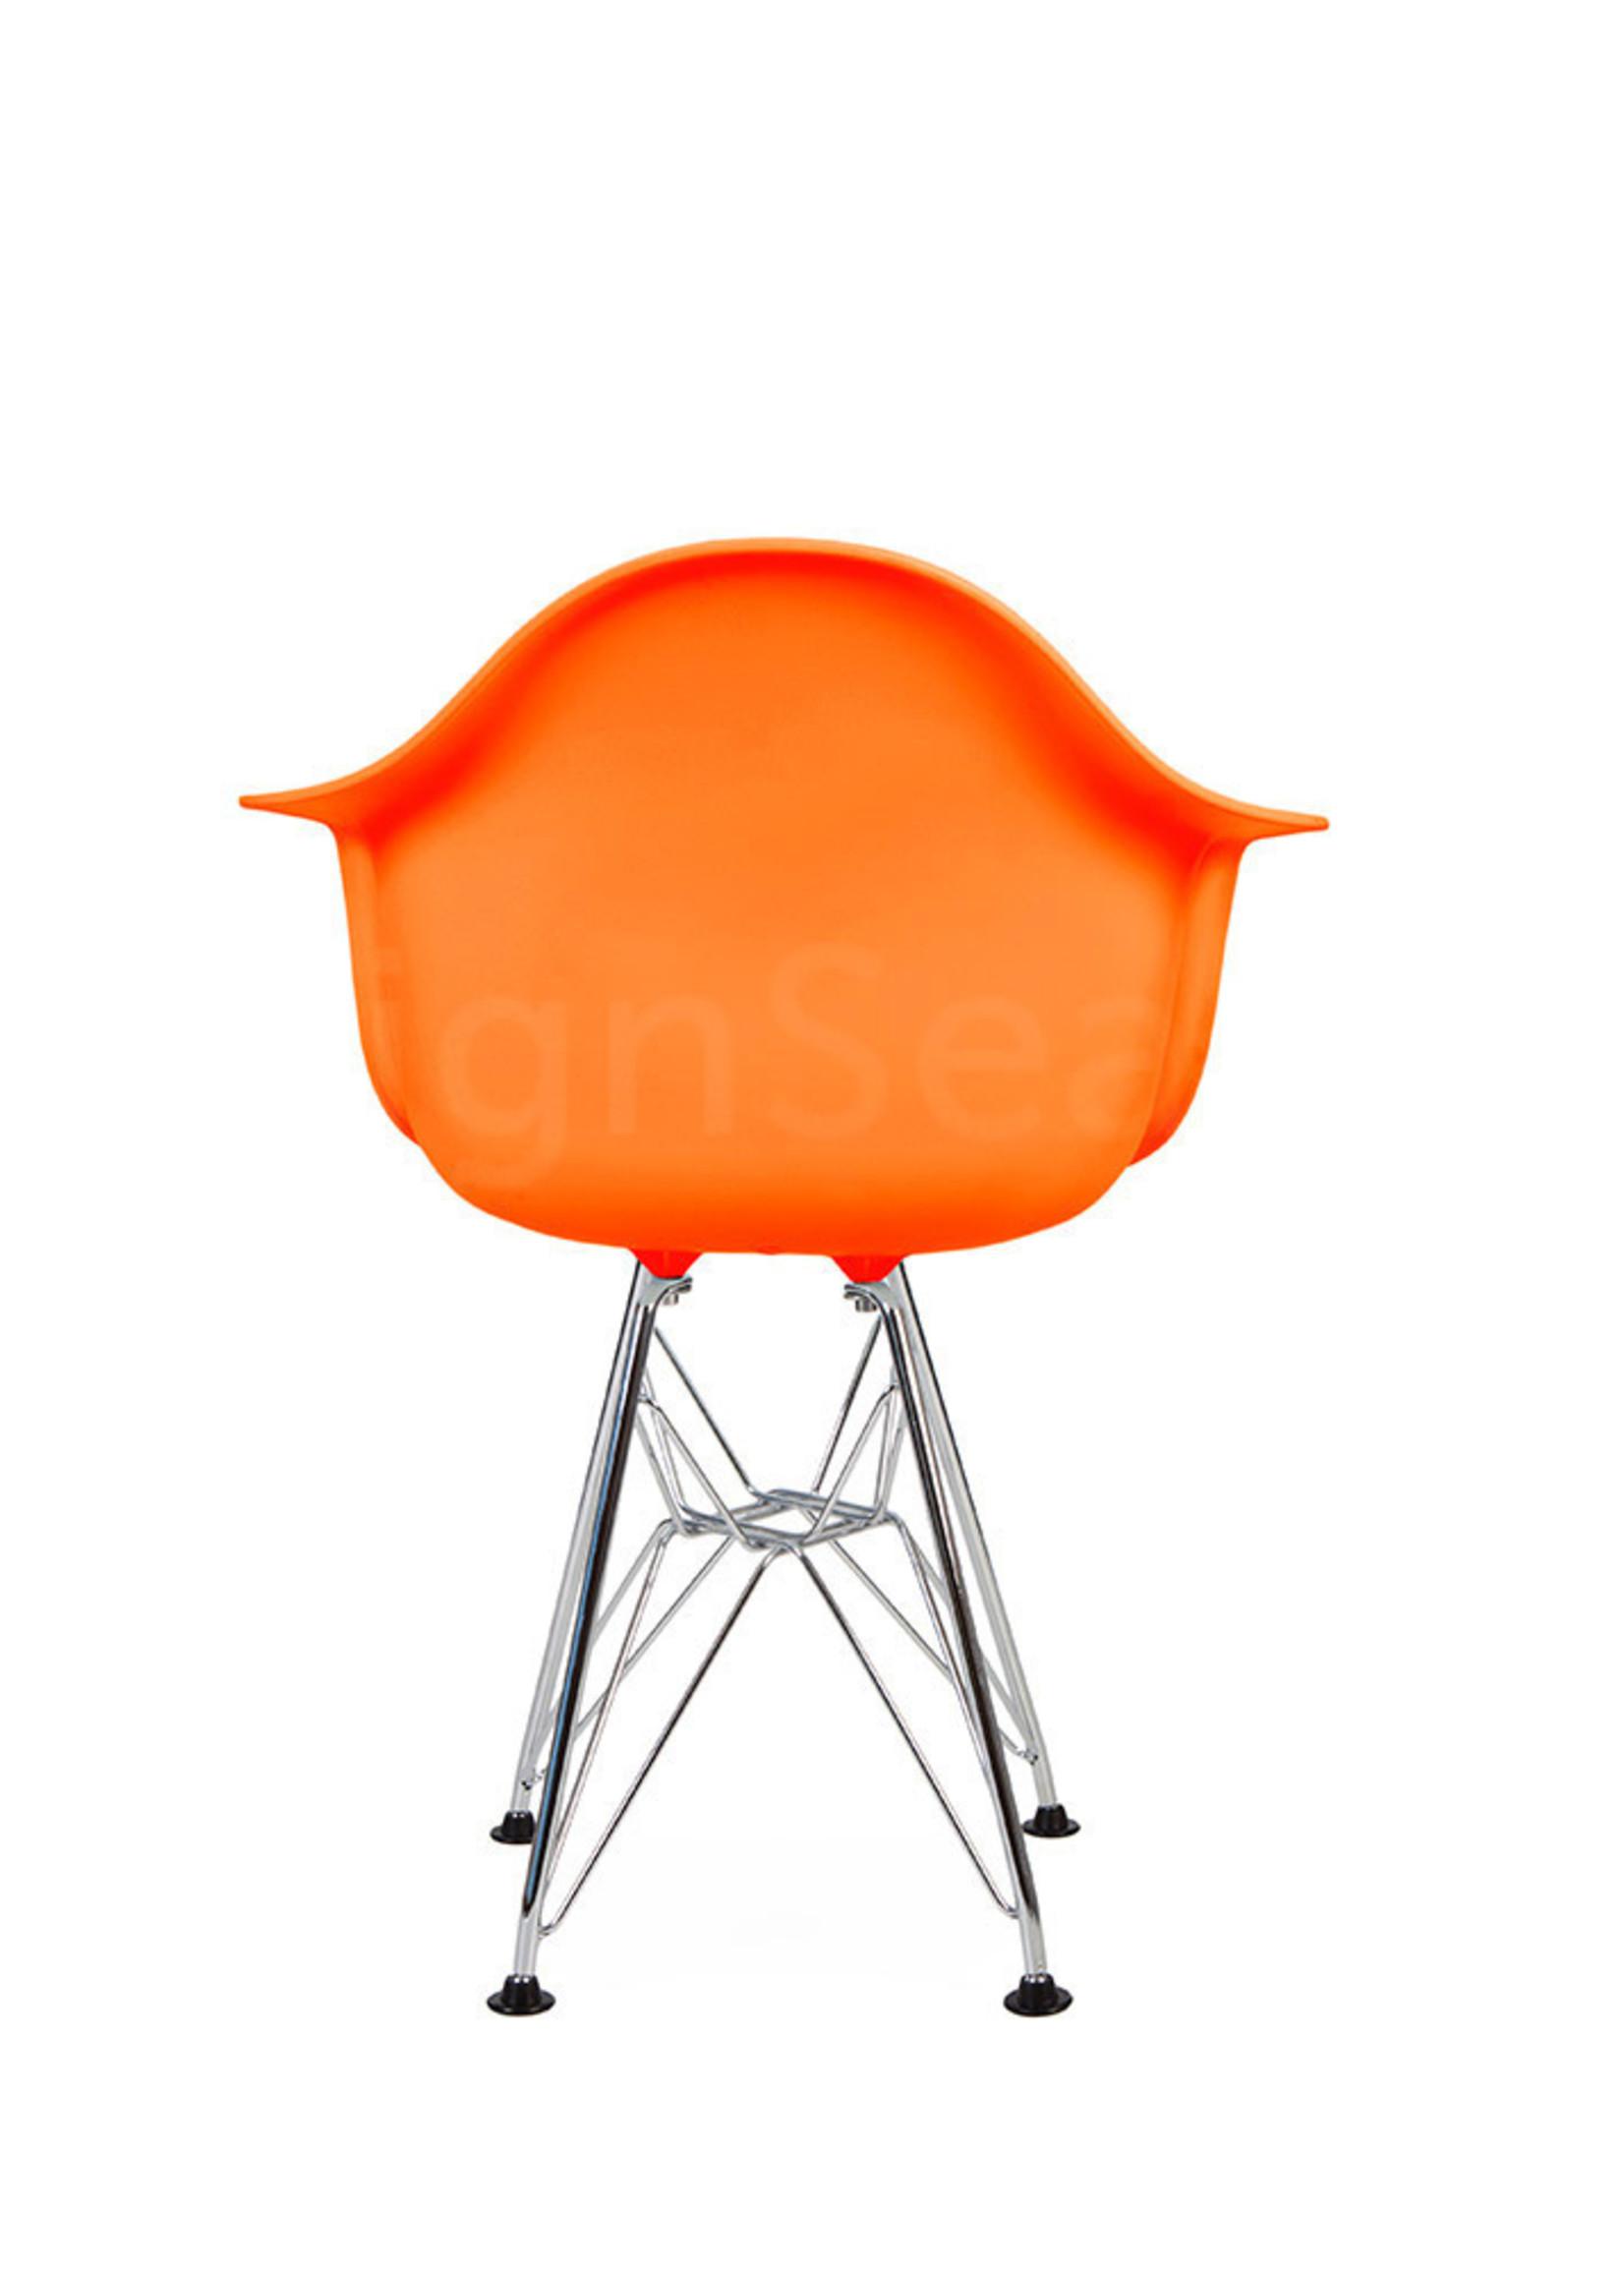 DAR Eames Design Kinderstoel Fel oranje